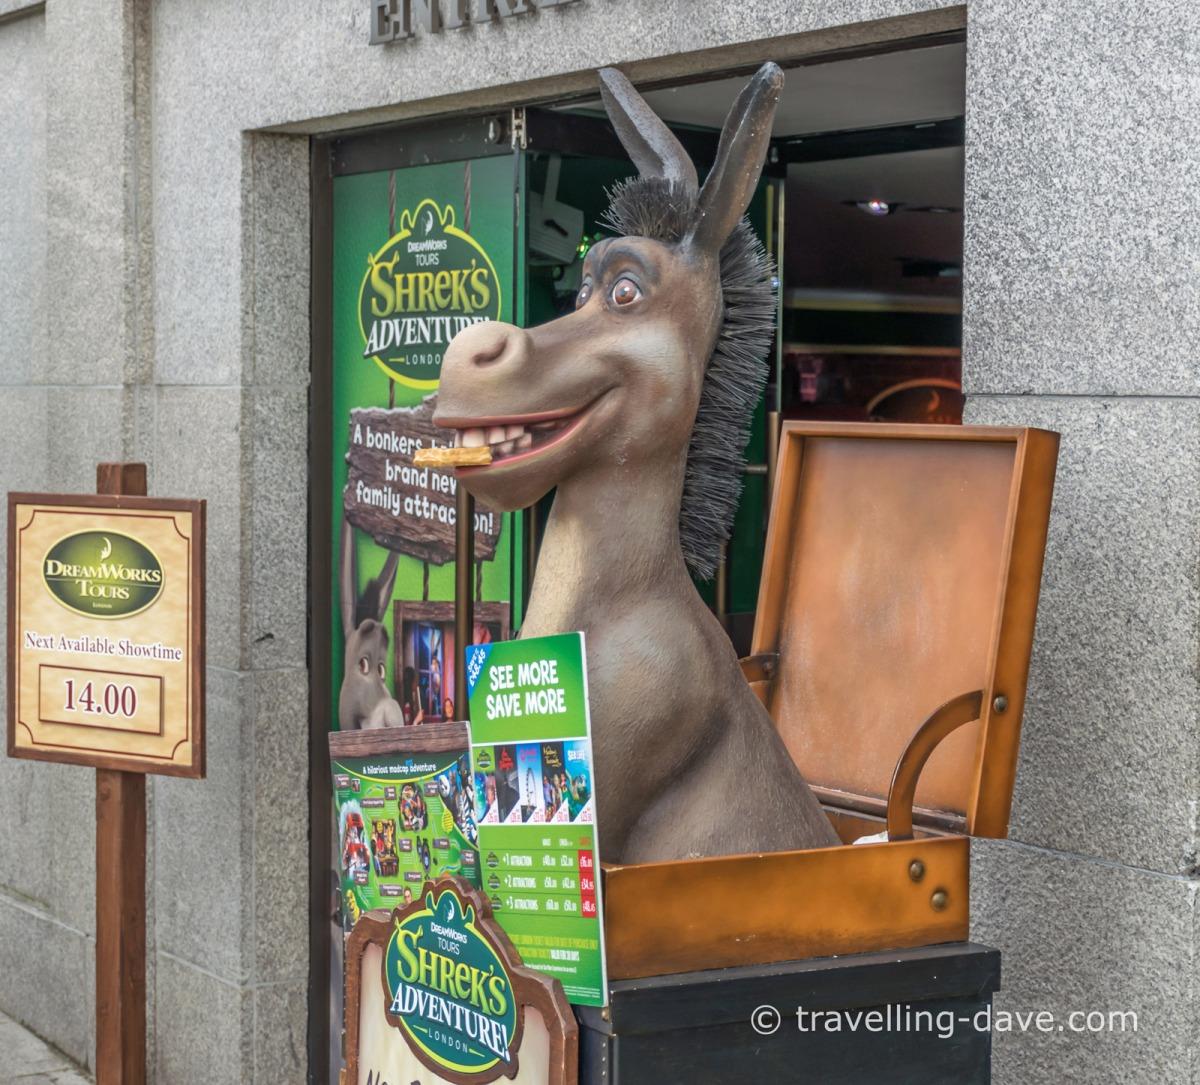 View of a figurine of Shrek's Donkey